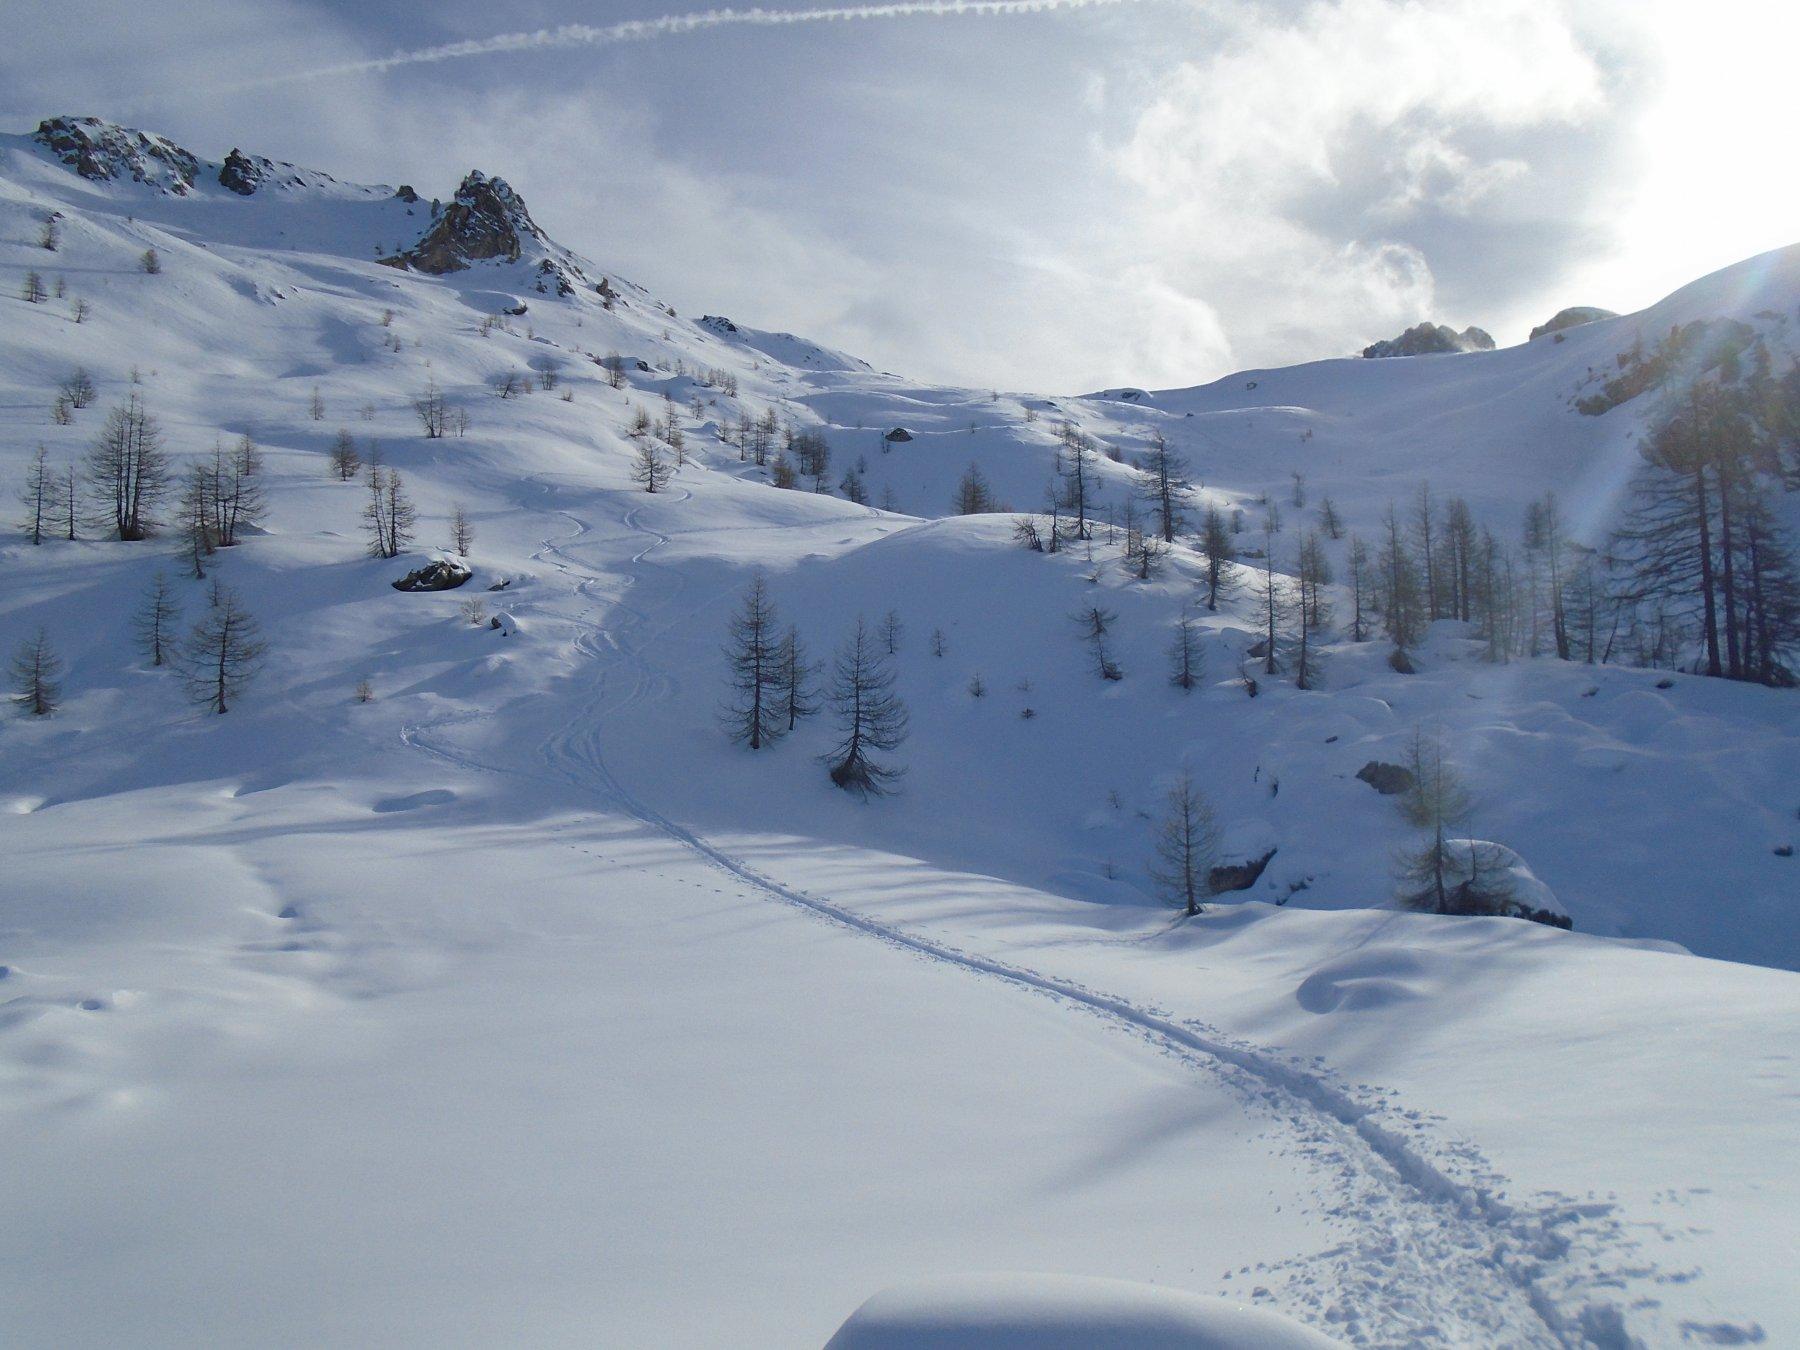 Bella neve in discesa sulla parte alta